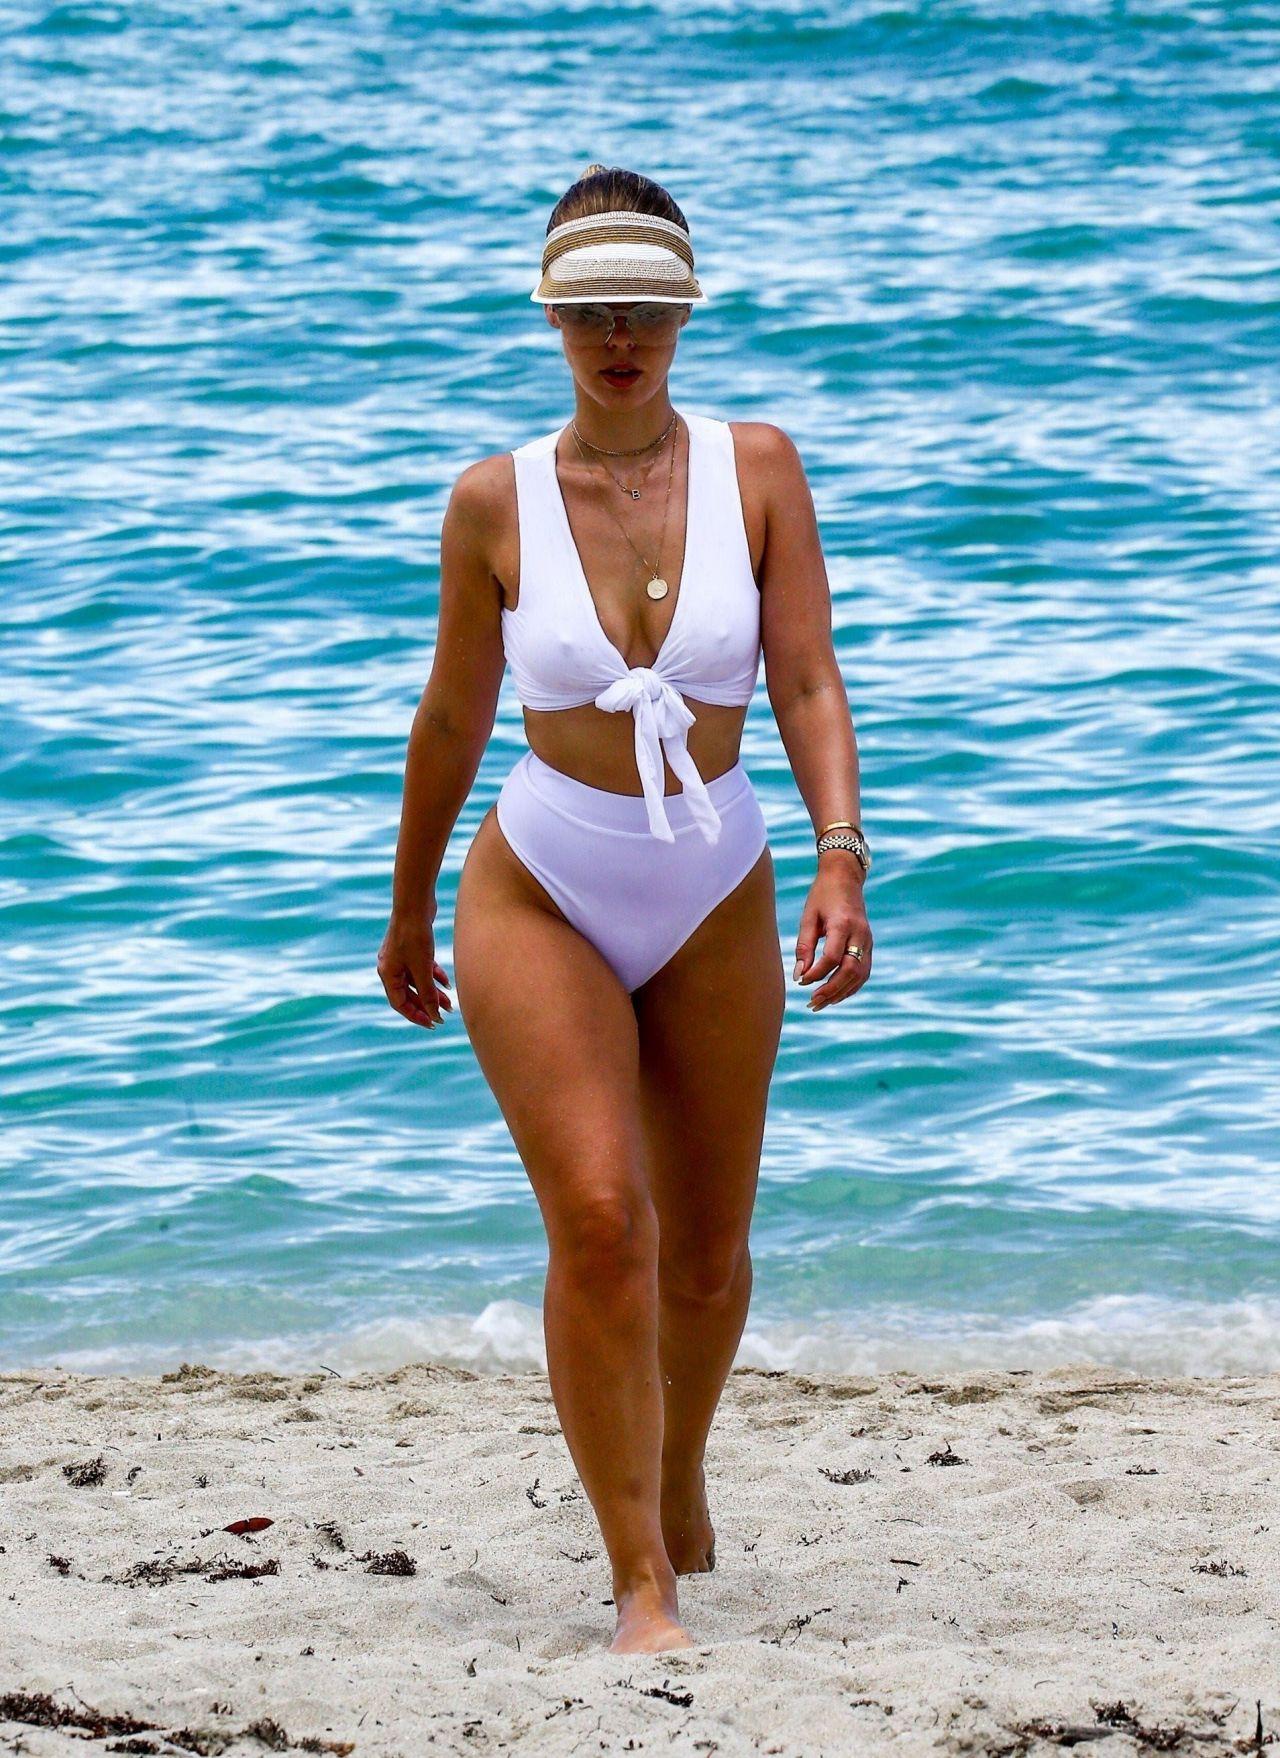 Celebrity Bianca Elouise nude photos 2019